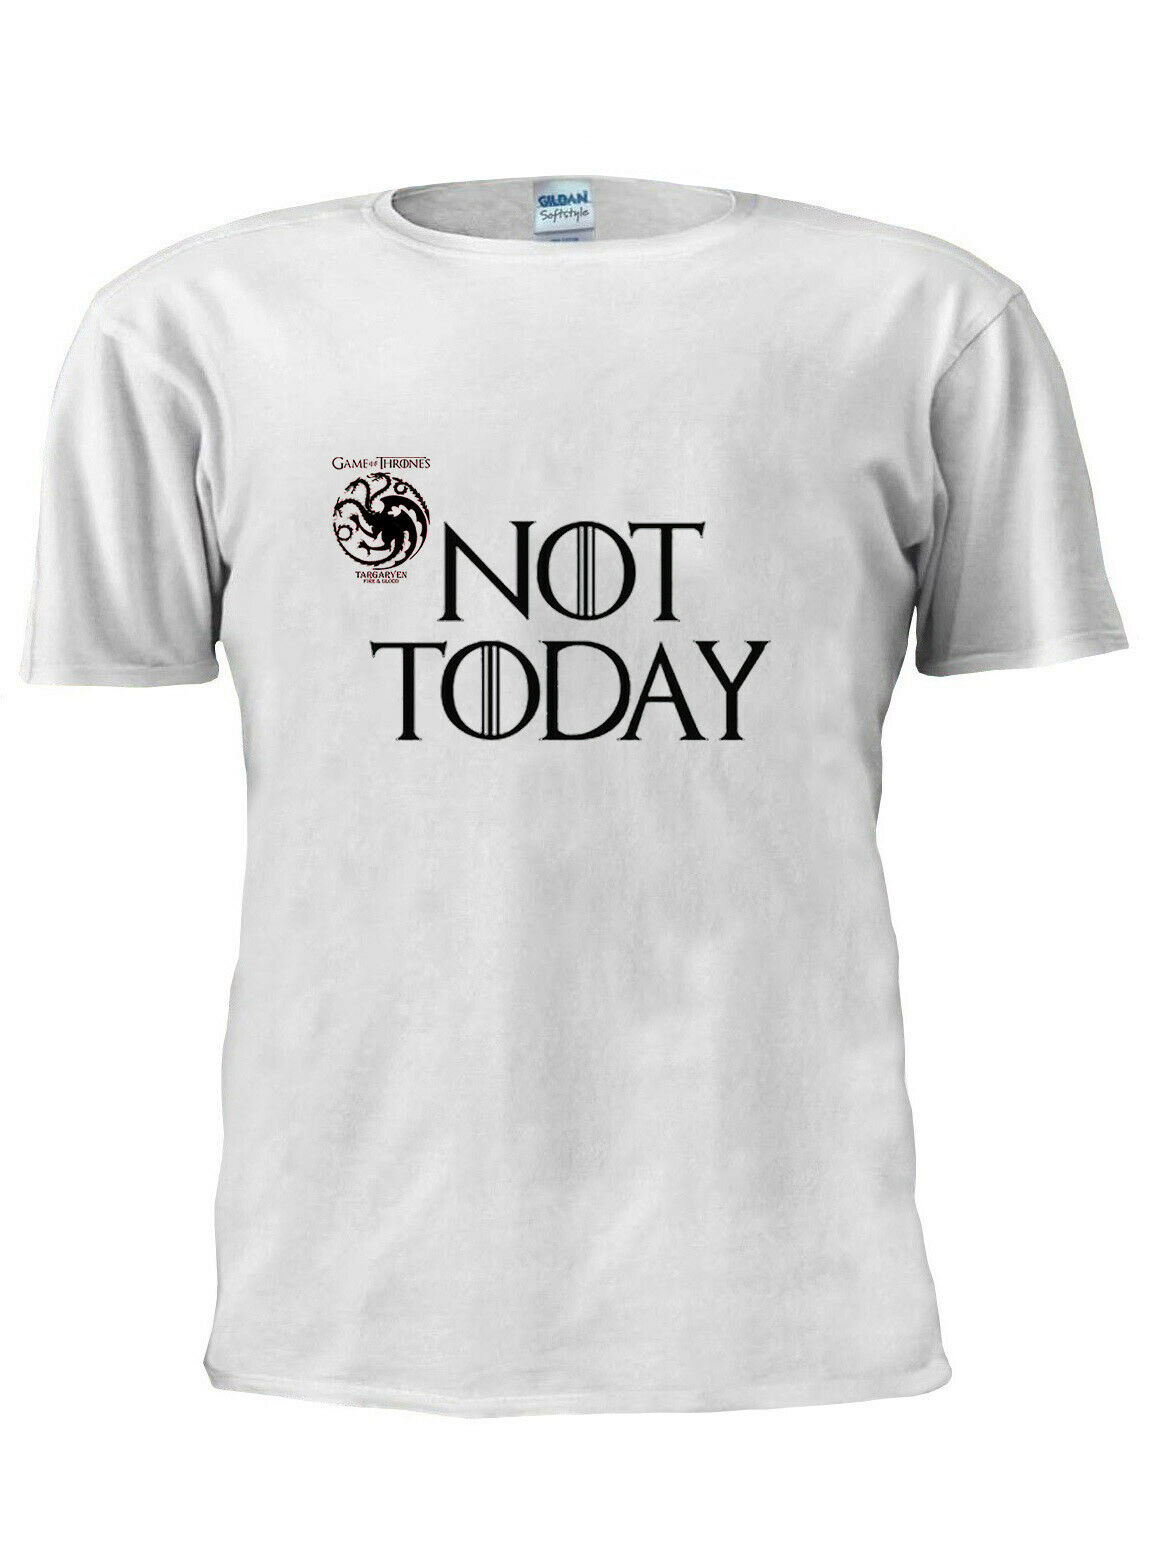 T-Shirt Game OF Thrones Arya Stark pas aujourd'hui hommes femmes unisexe T-Shirt M209 100% coton T-Shirt hauts en gros T-Shirt